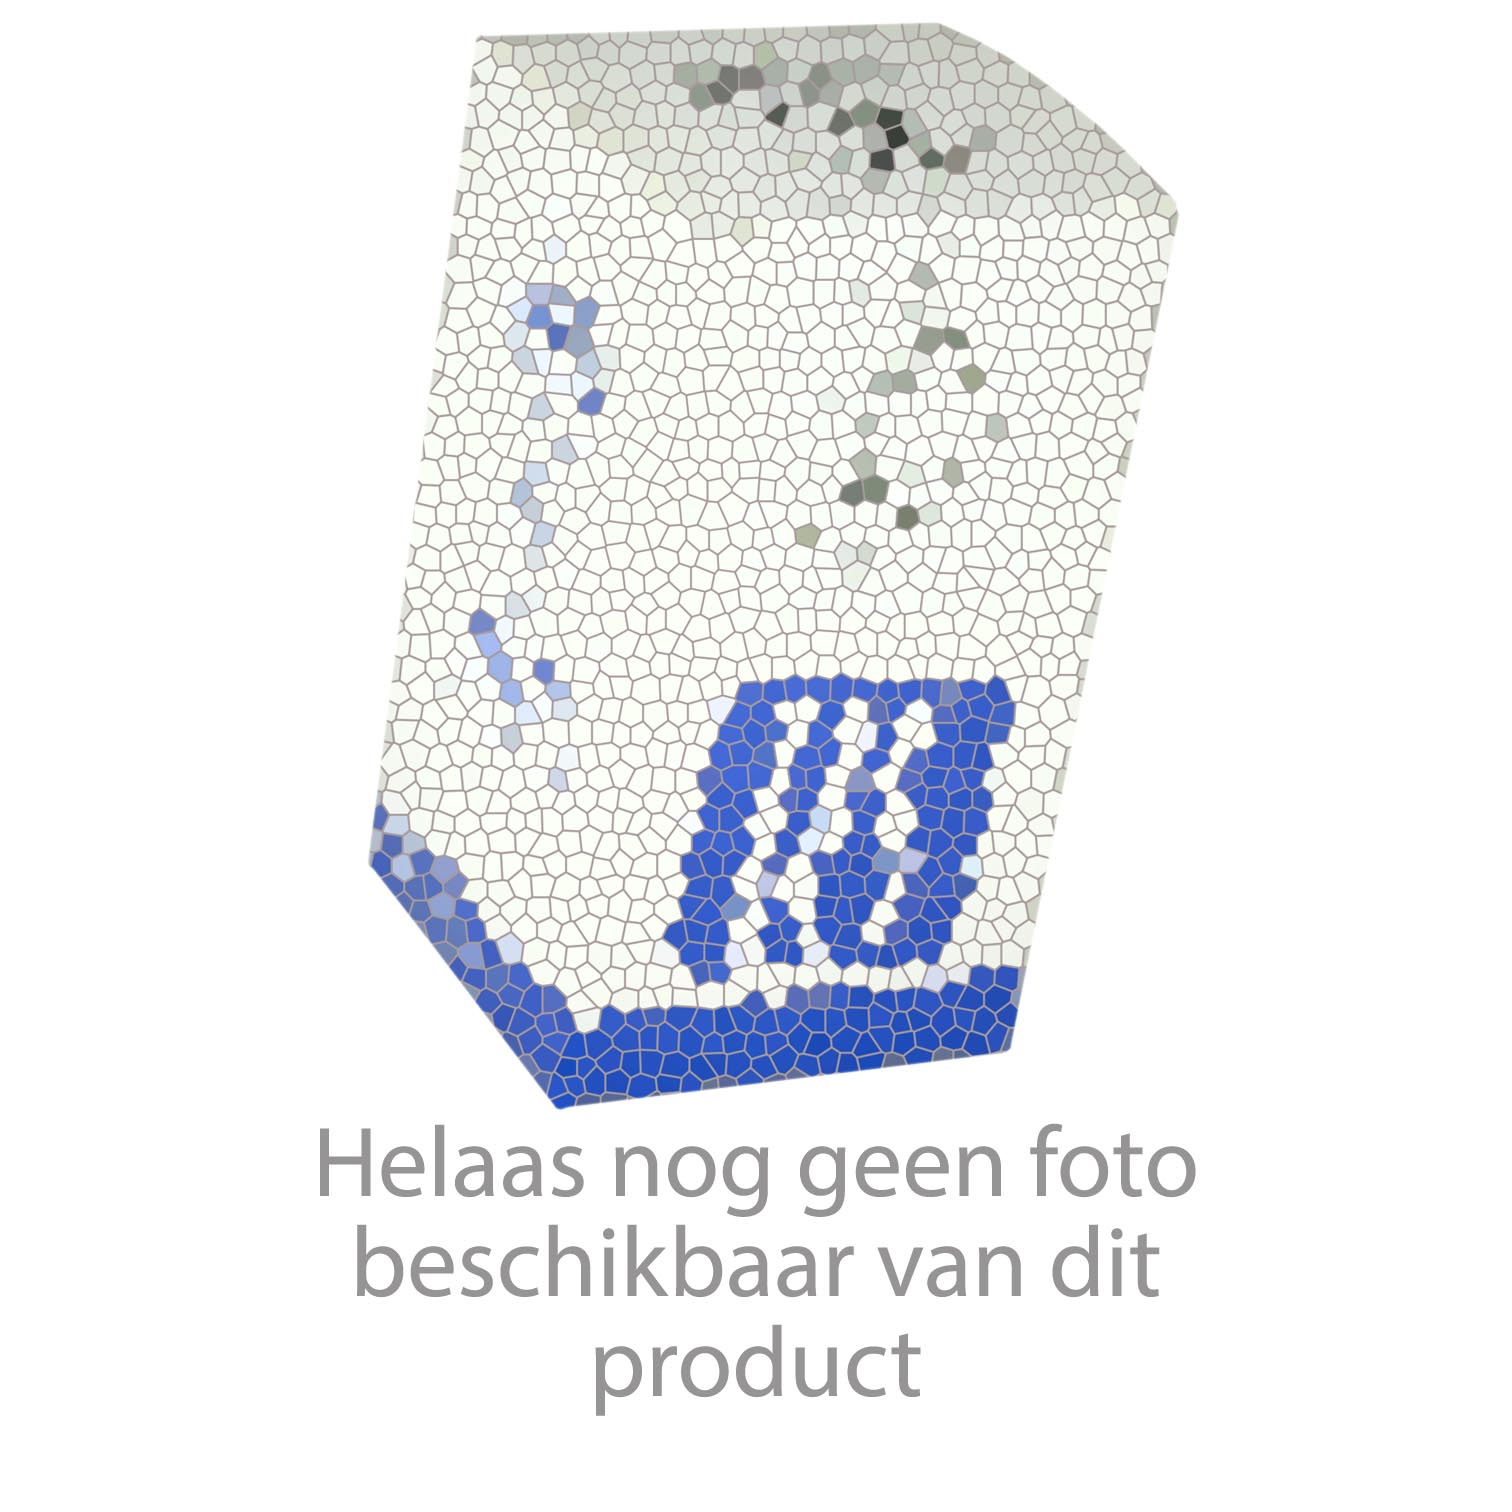 Geberit Gis WC-element H98 met reservoir UP200 planchet- en frontbediening